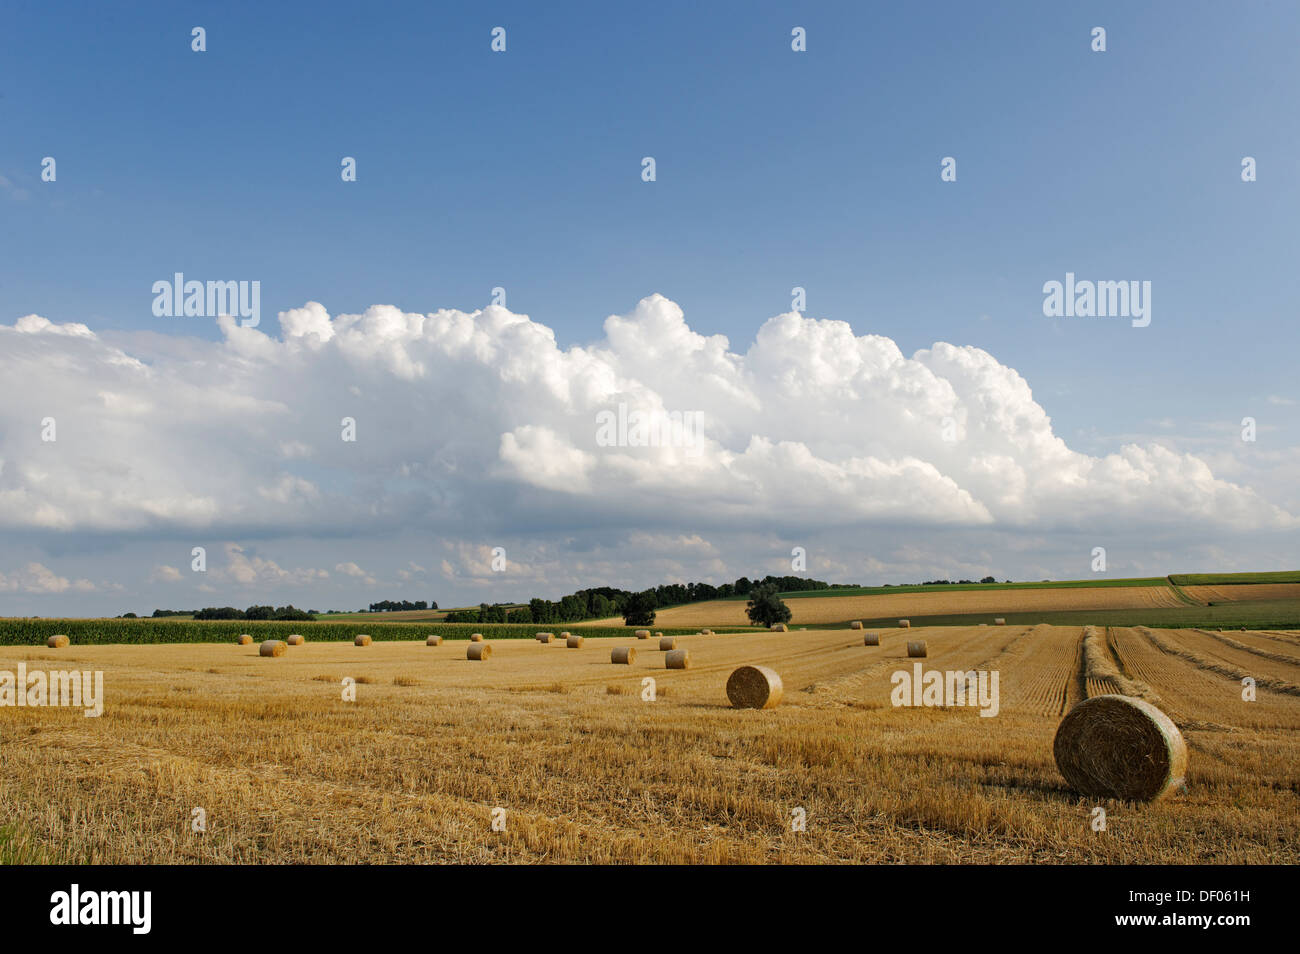 Straw bales on harvested corn fields, near Pellheim, Dachau, Upper Bavaria, Bavaria, Germany - Stock Image